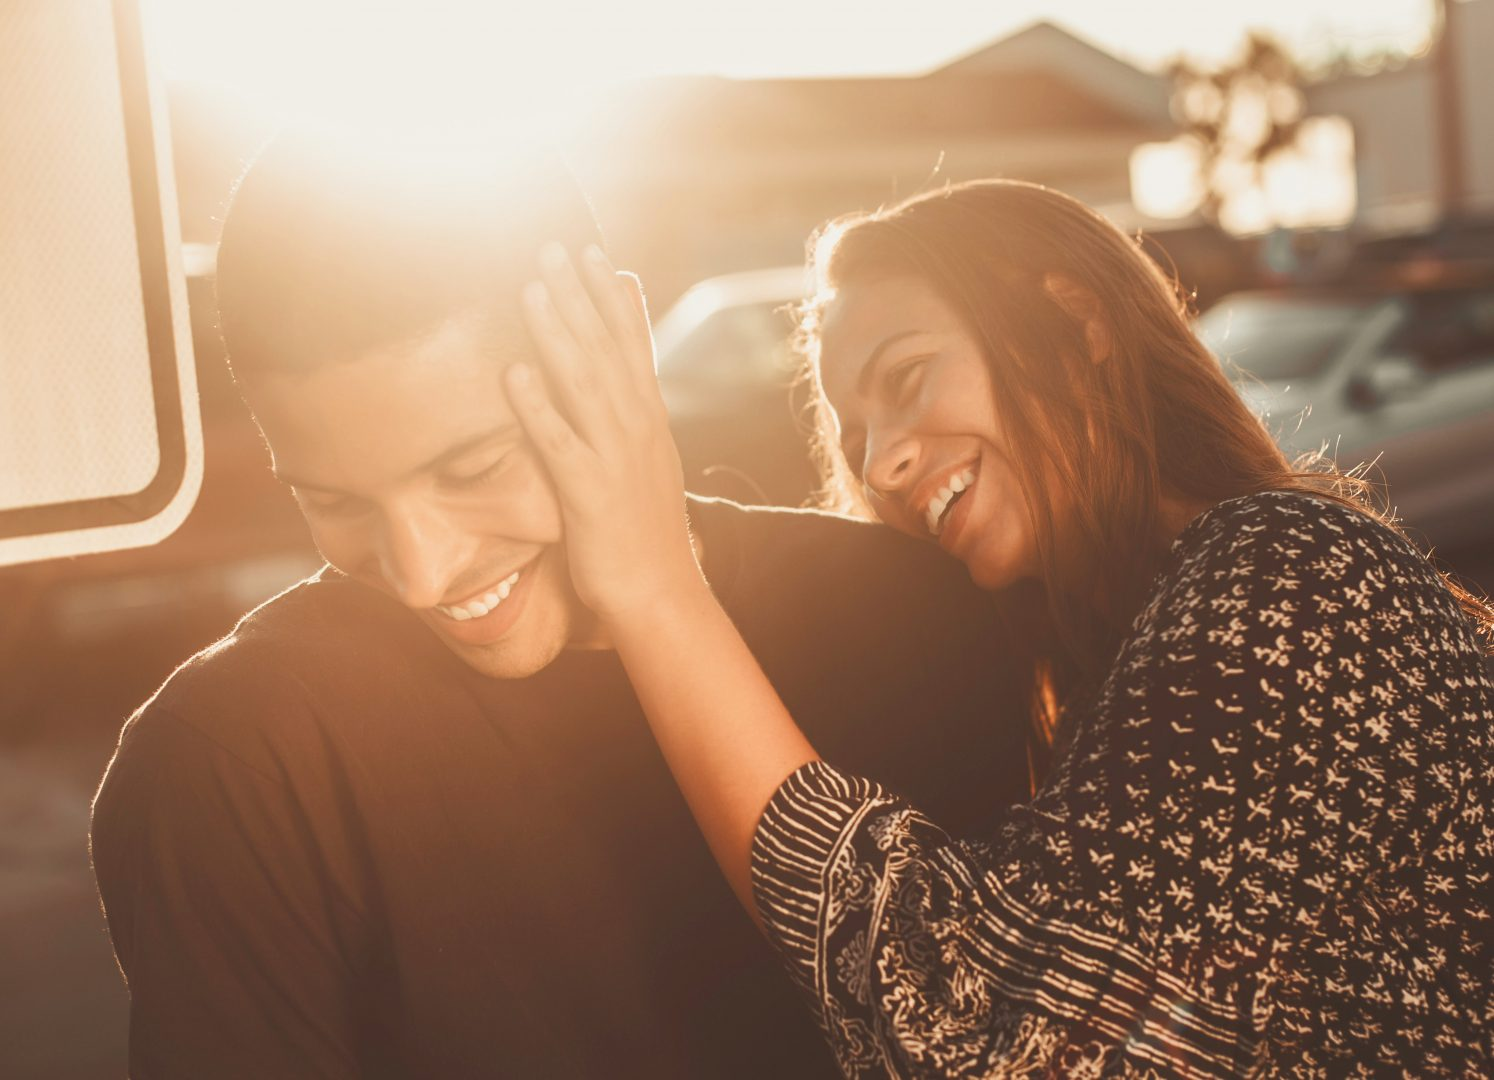 Dating horoscope, zodiac sign dating style